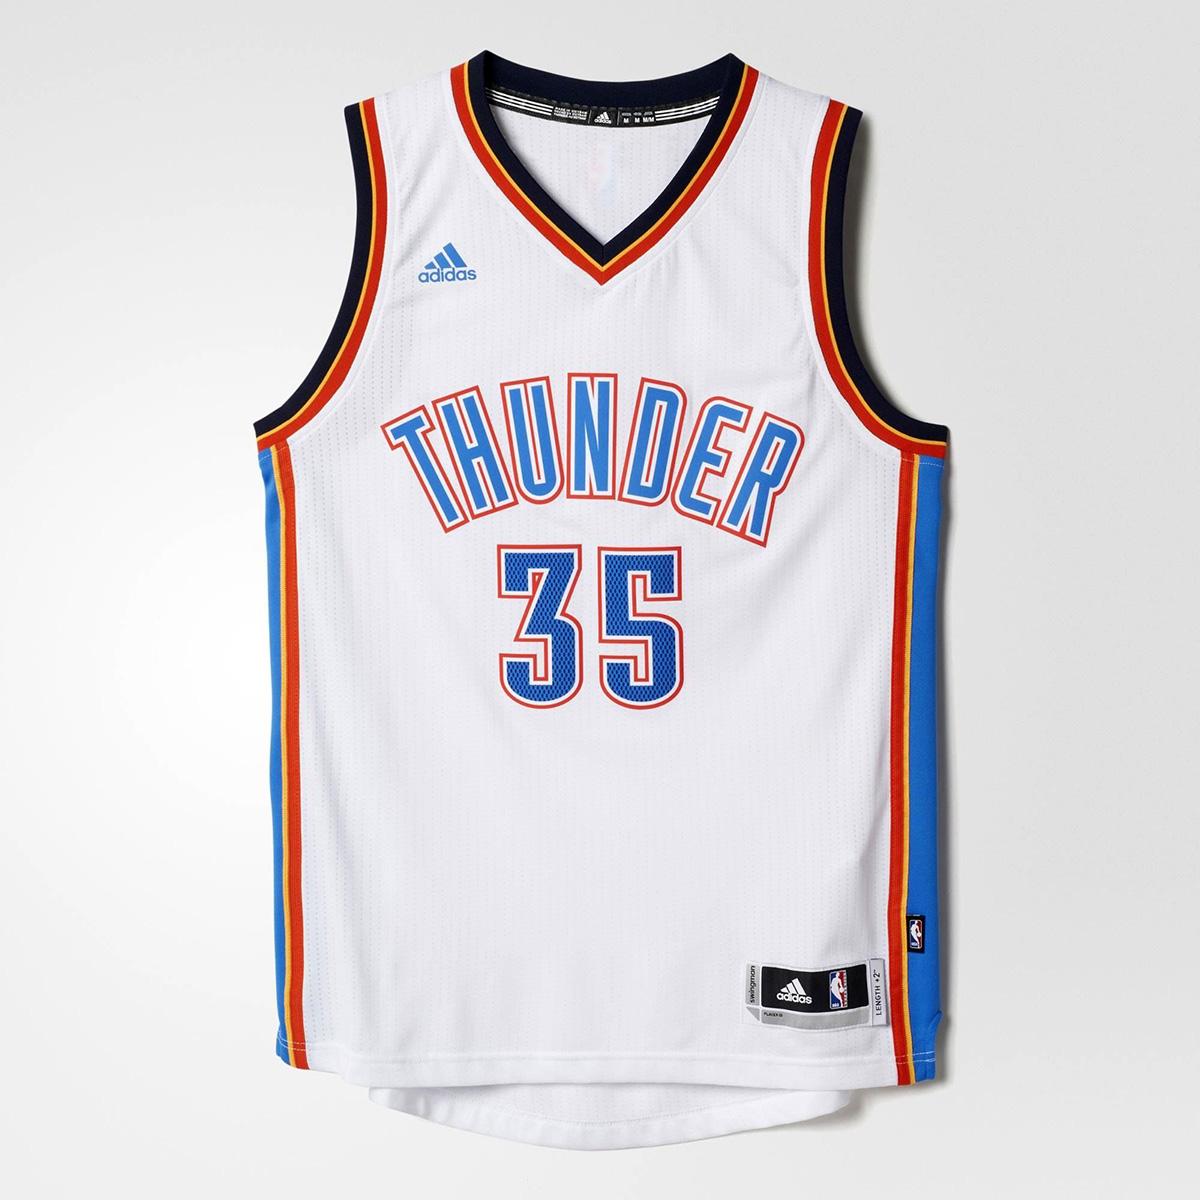 bda79c712 mens oklahoma city thunder kevin durant adidas light blue swingman road  jersey 2  adidas nba kevin durant oklahoma city thunder swingman jersey